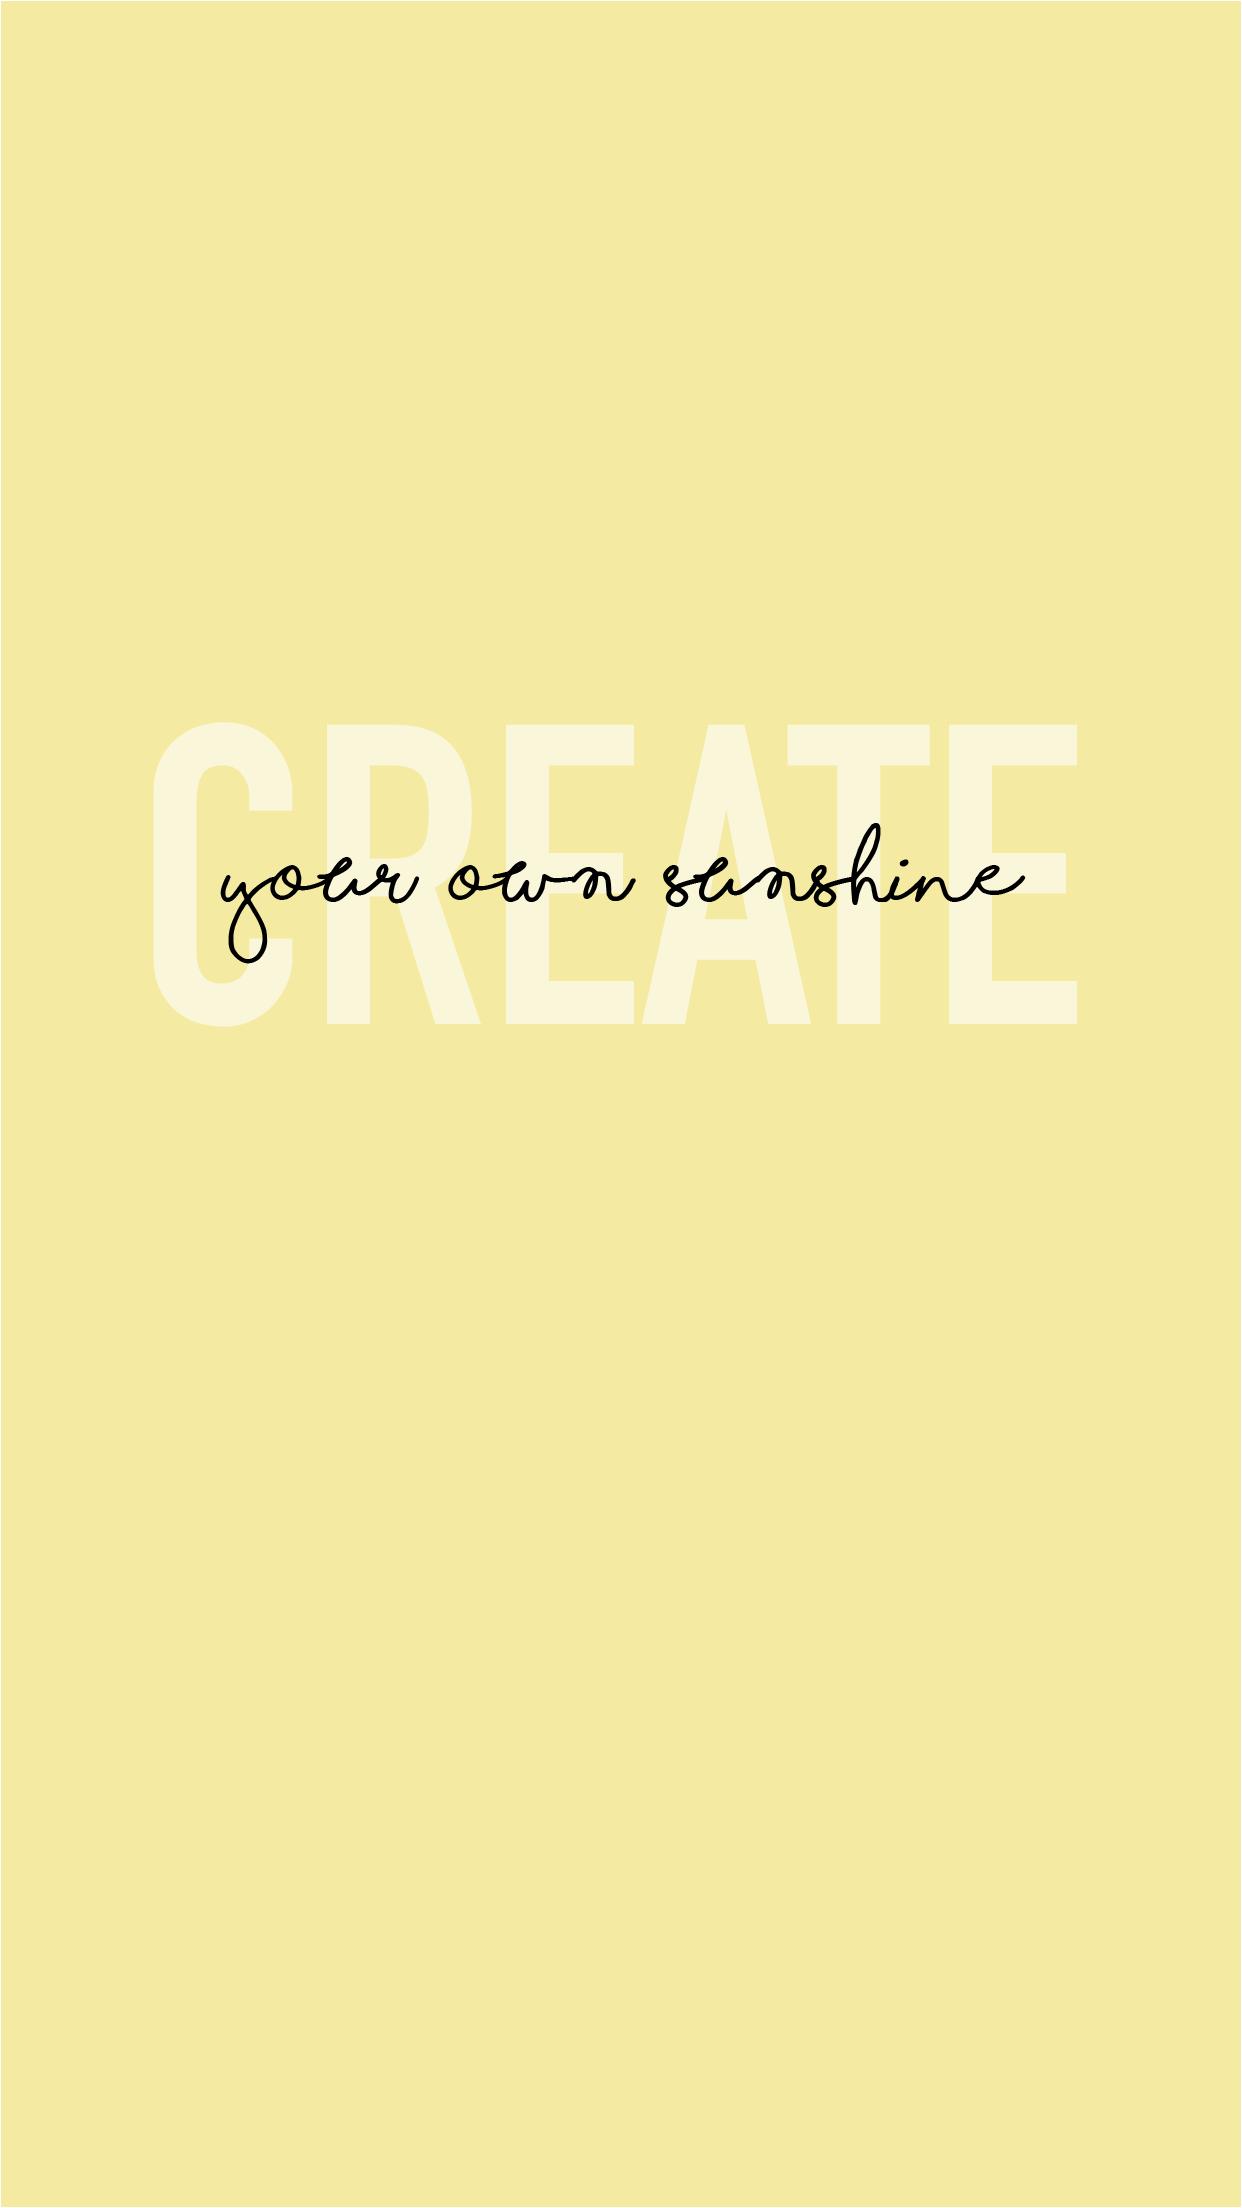 Create Your Own Sunshine Yellow Wallpaper Yellow Aesthetic Pastel Yellow Art Print